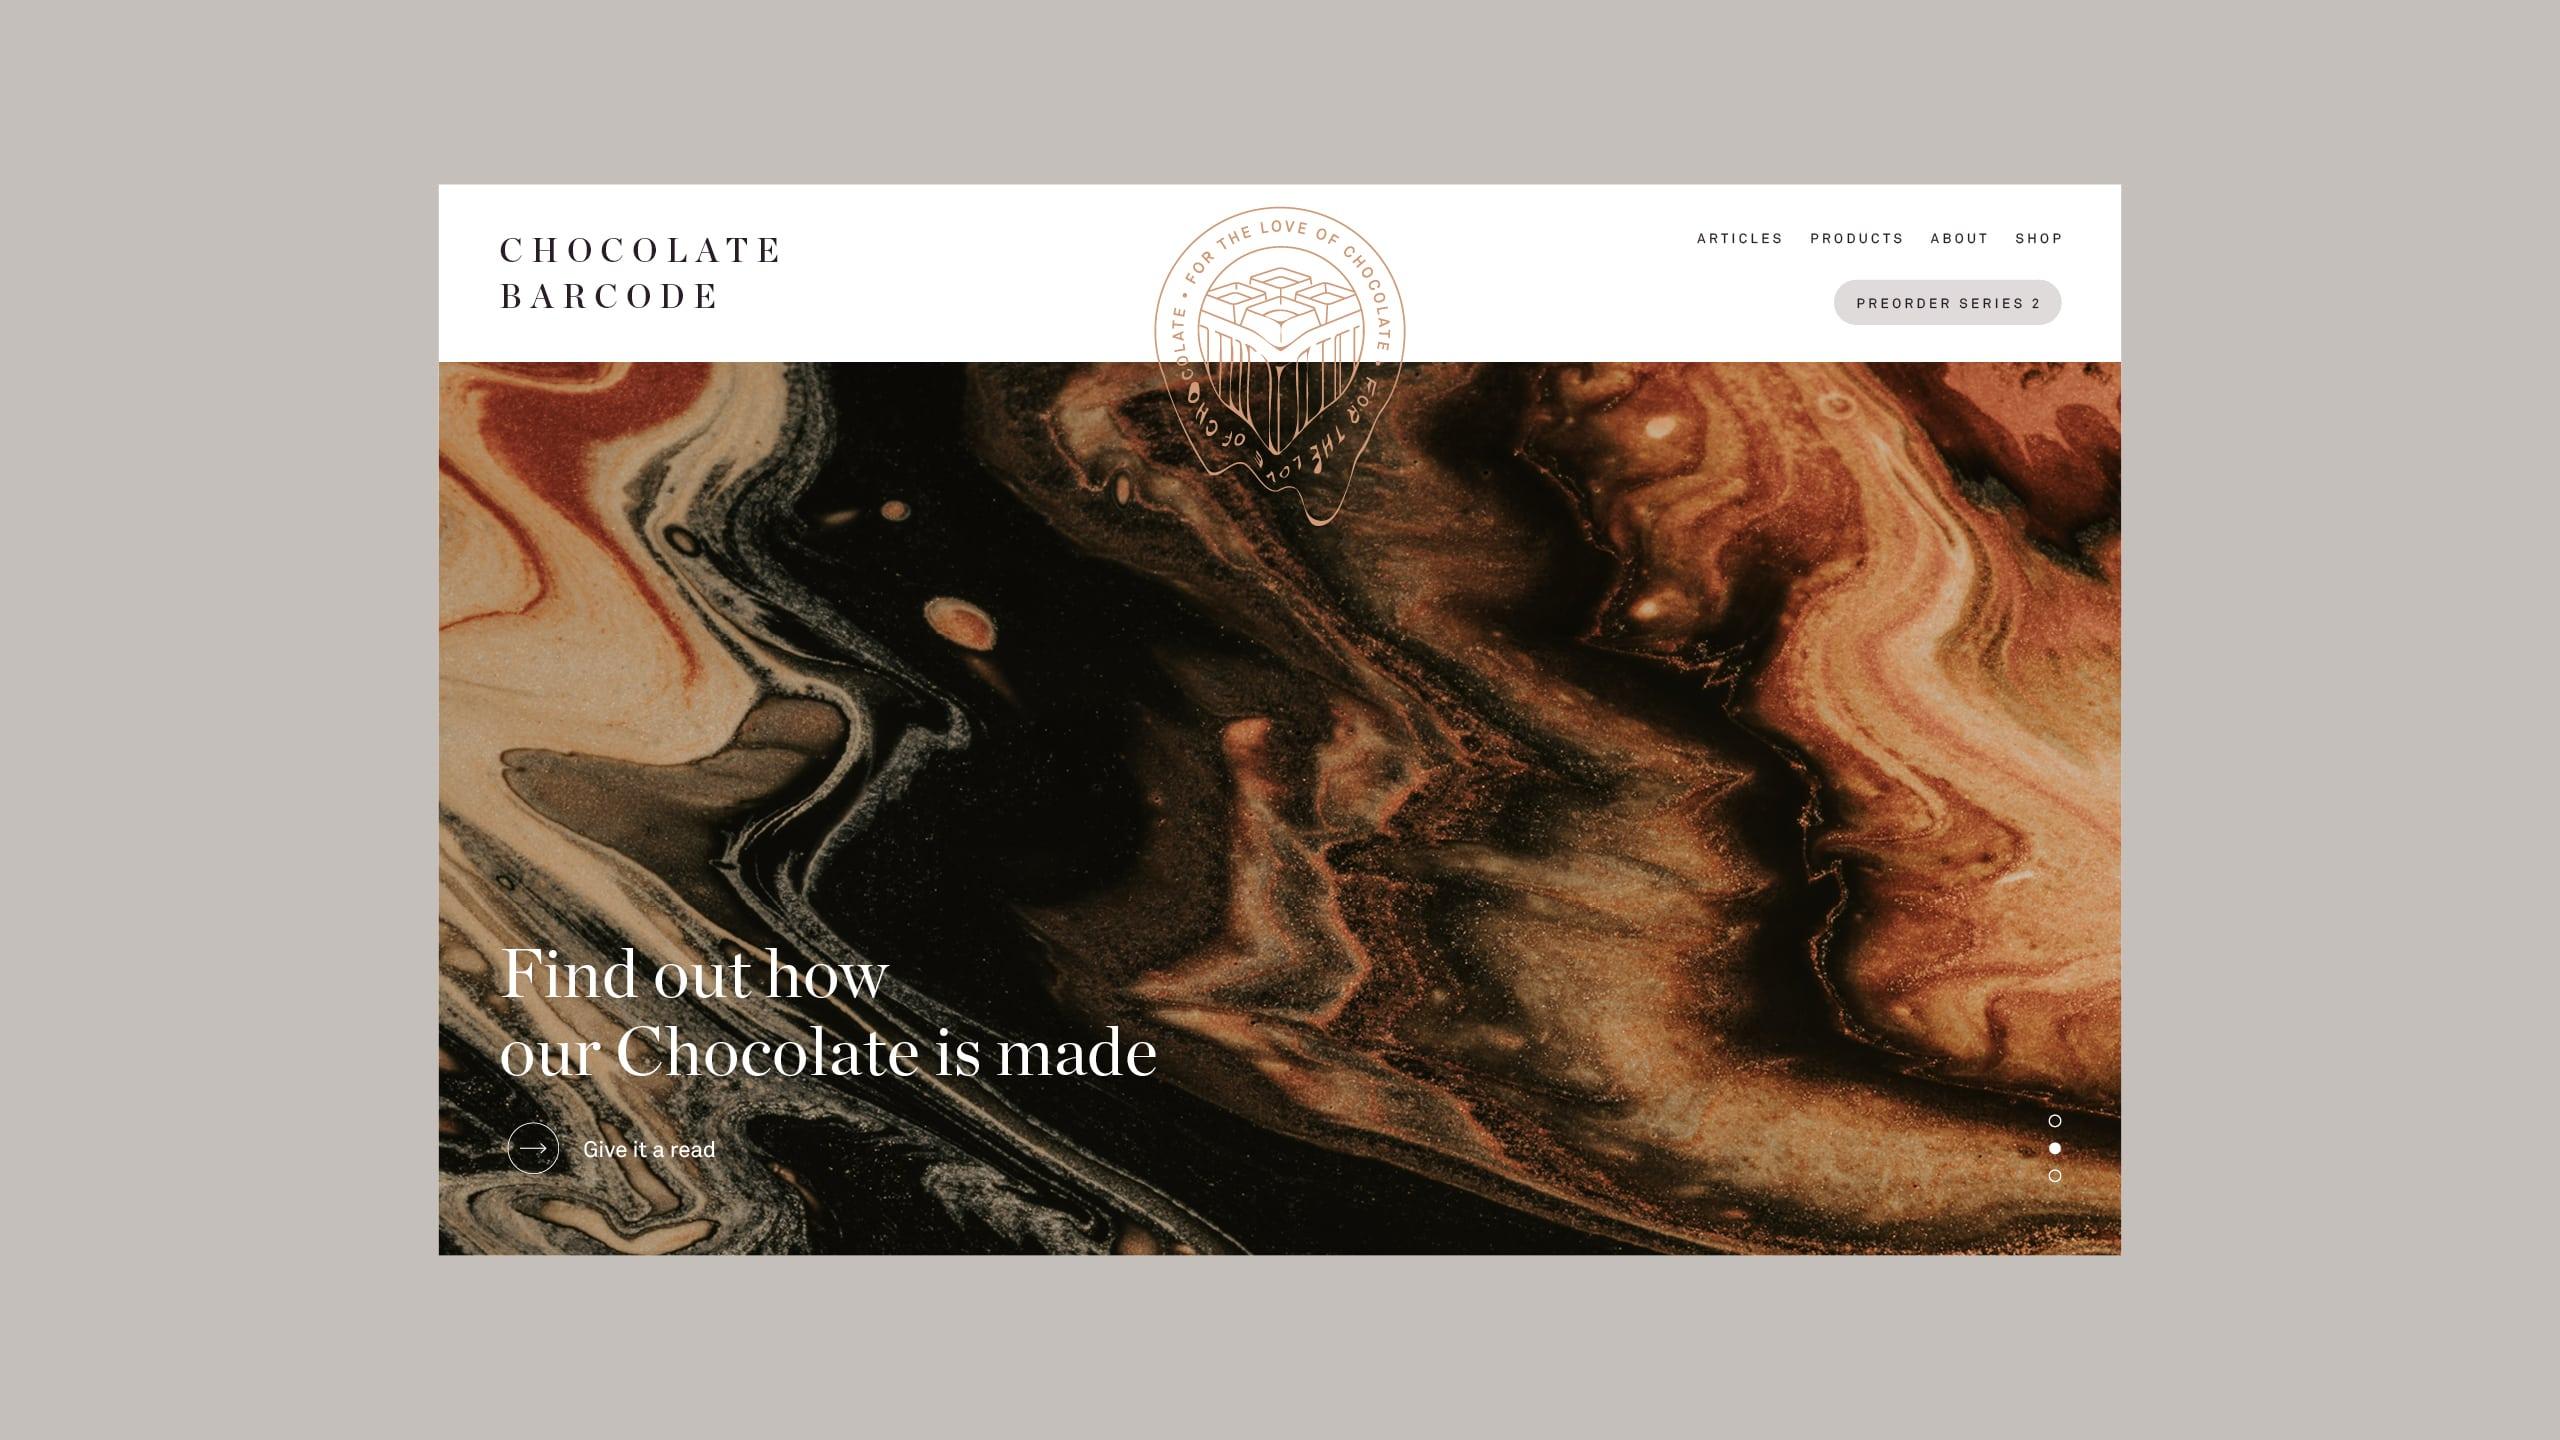 mantik-digital-branding-development-agency-chocolate-packaging-webdesign-design-14-min